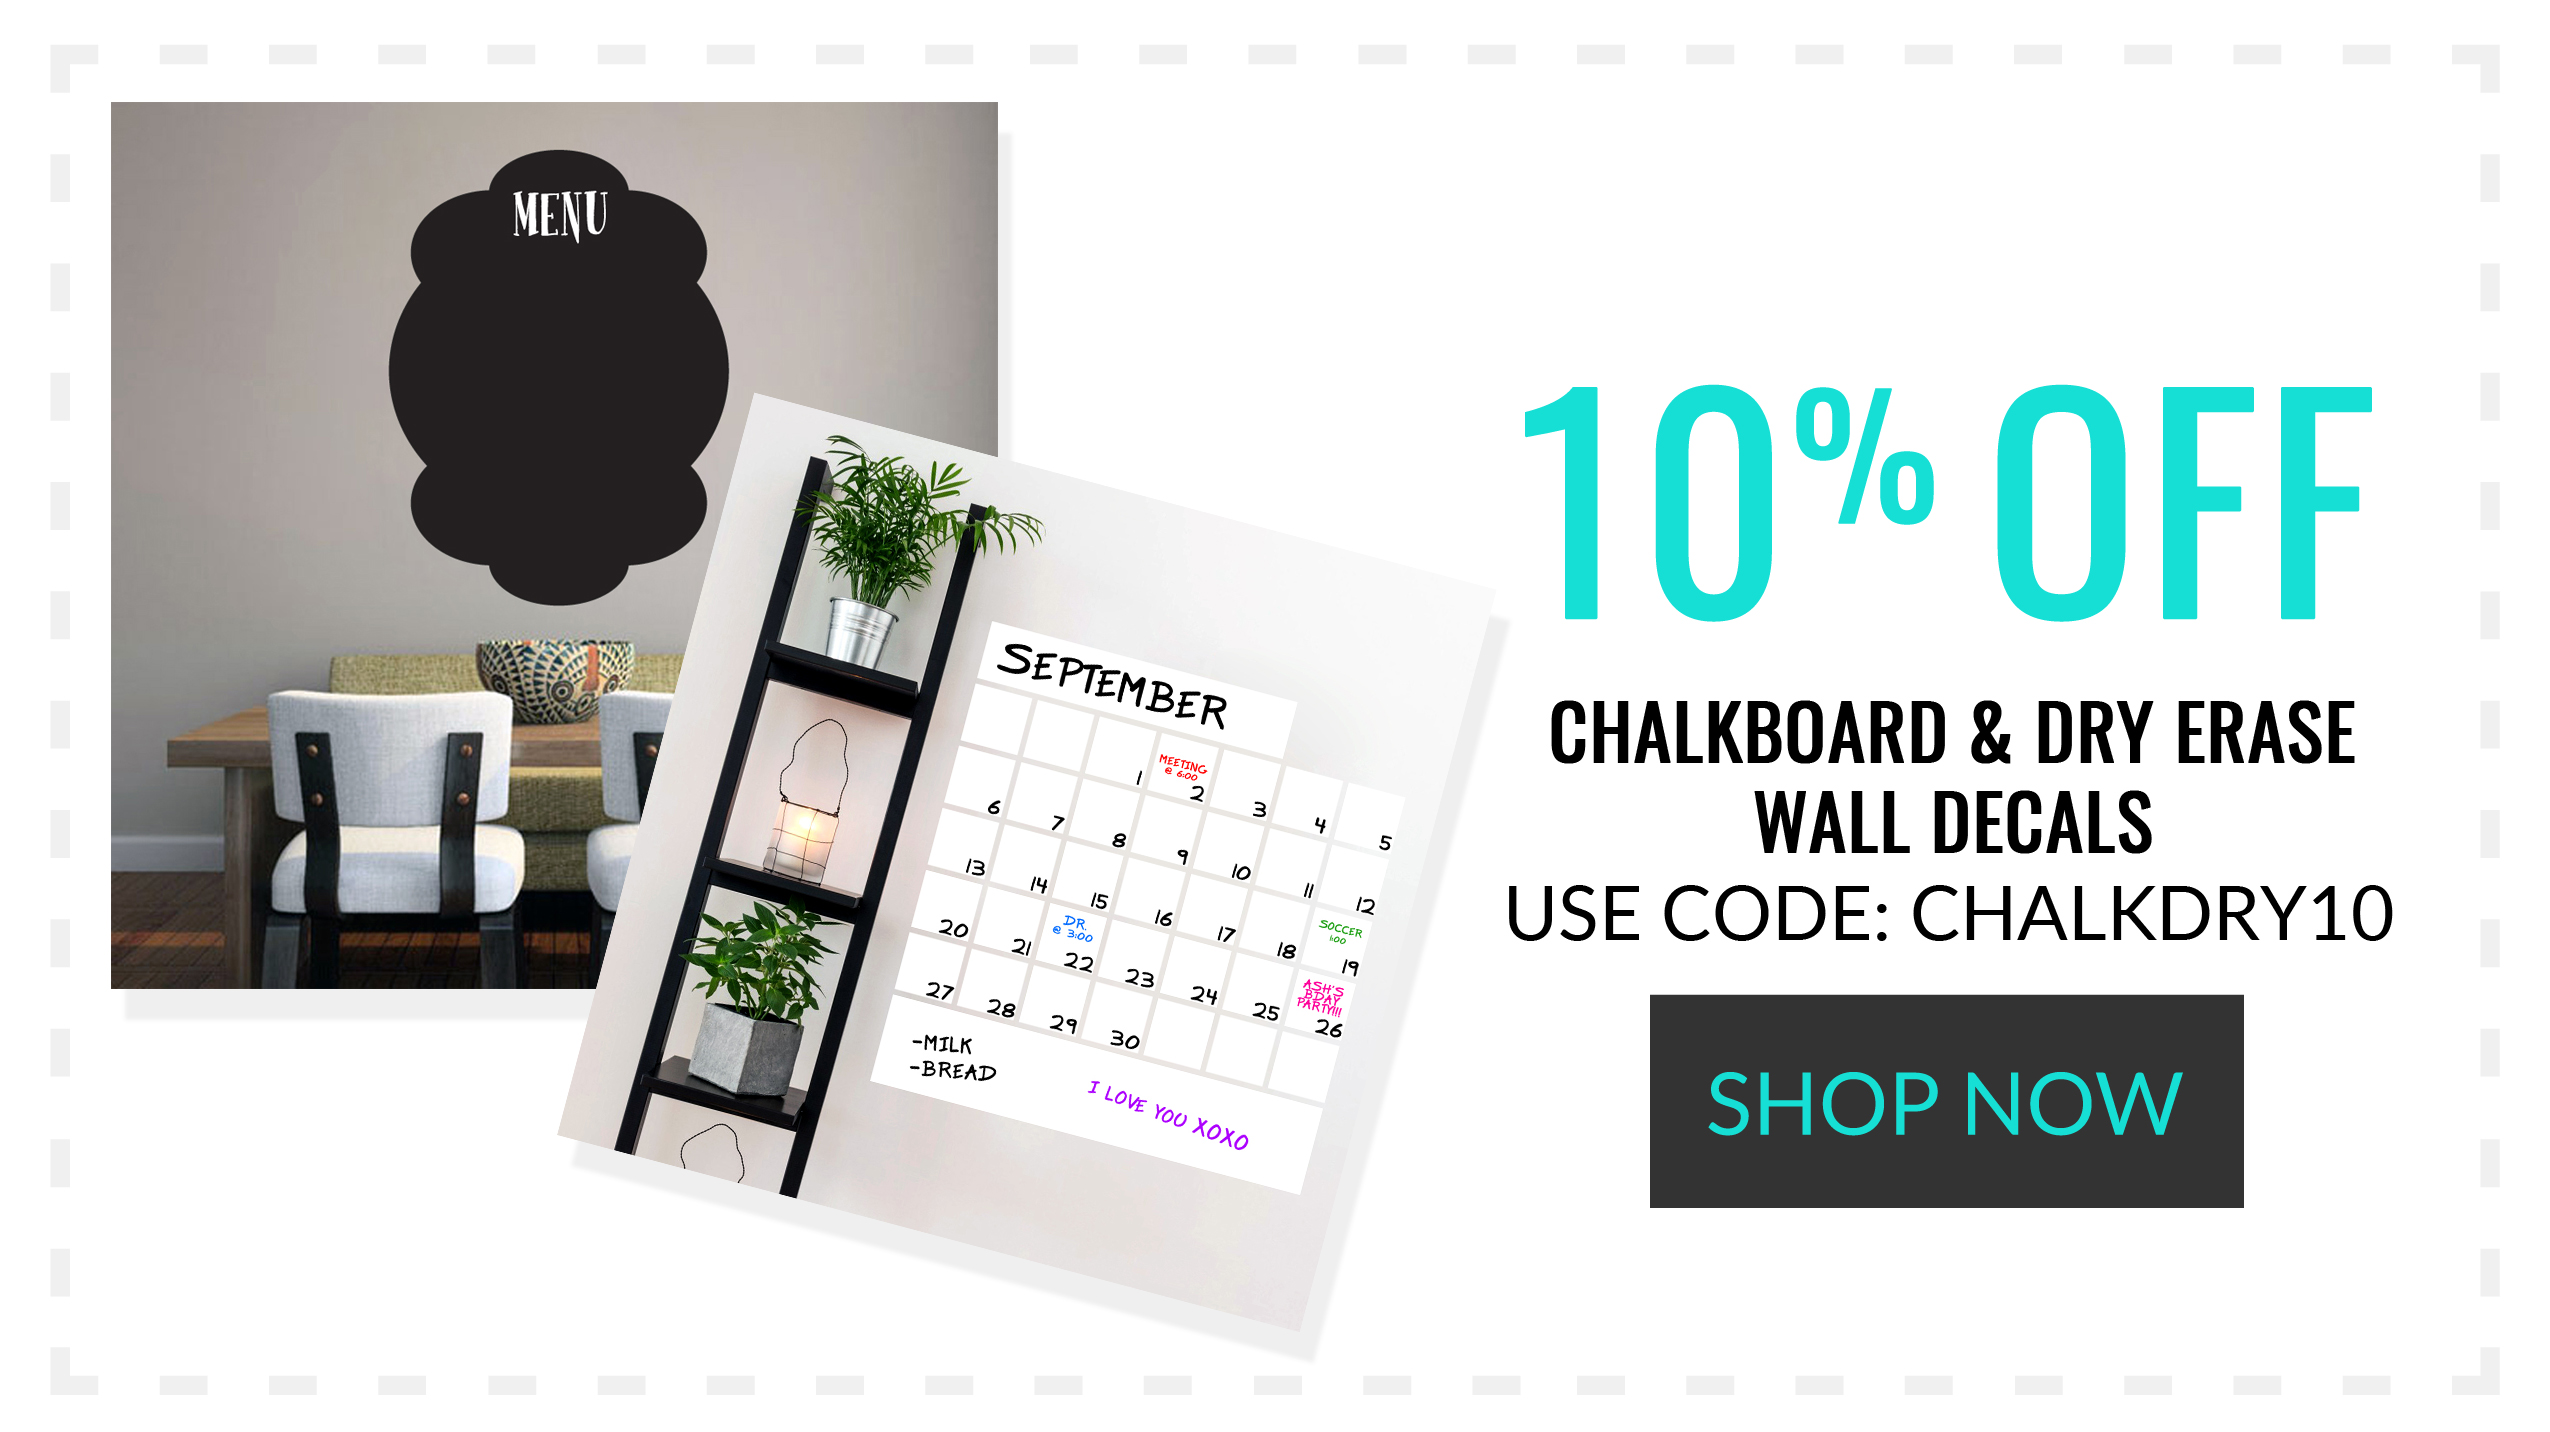 chalkdry10sale.jpg